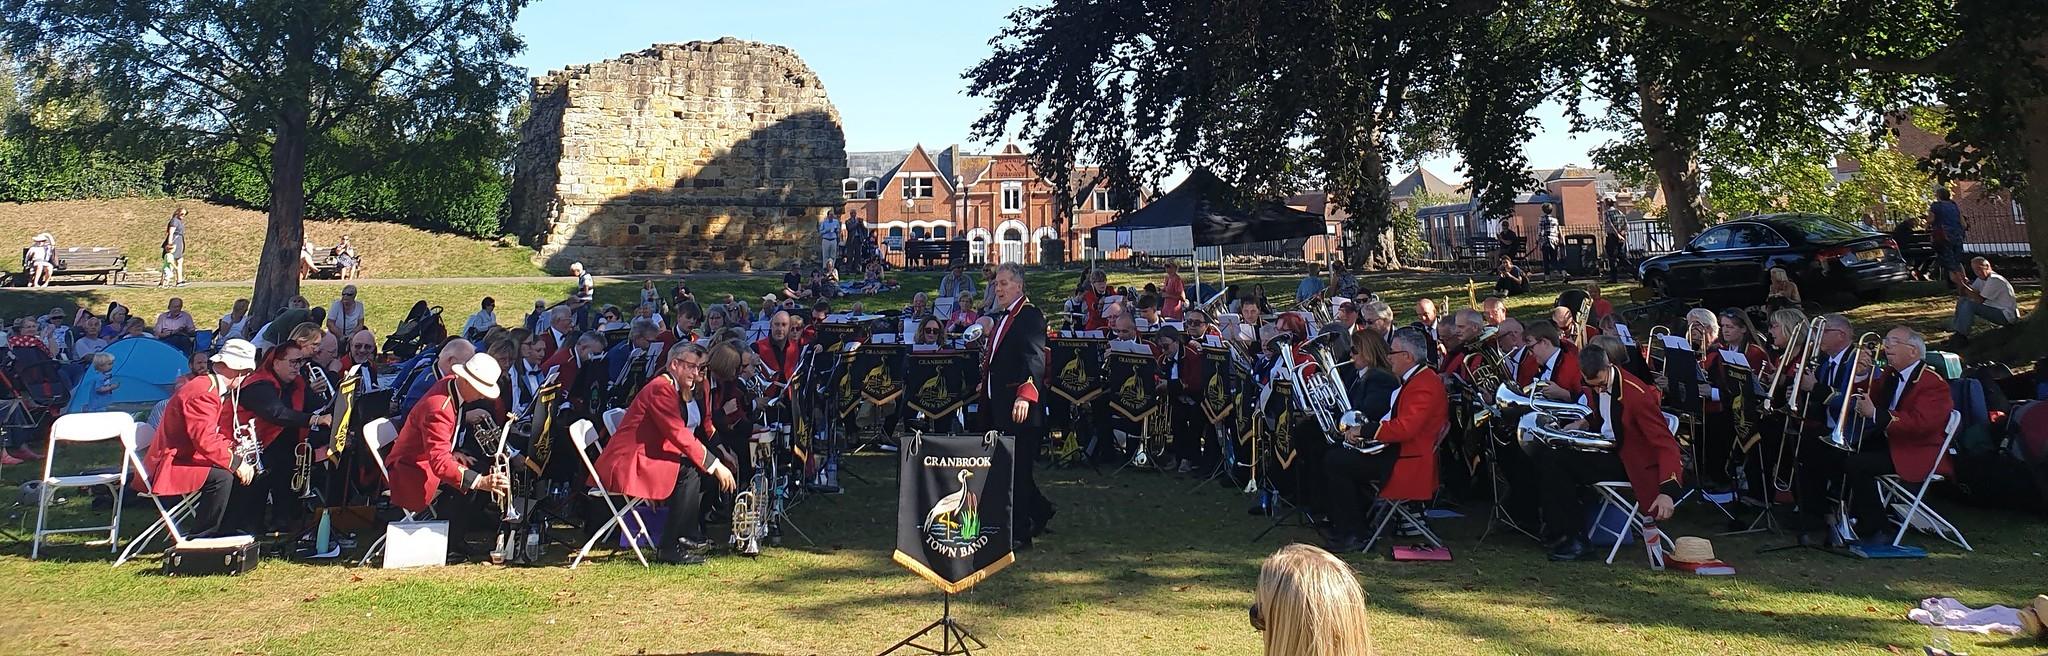 MacMillan Fundraiser – Tonbridge Castle